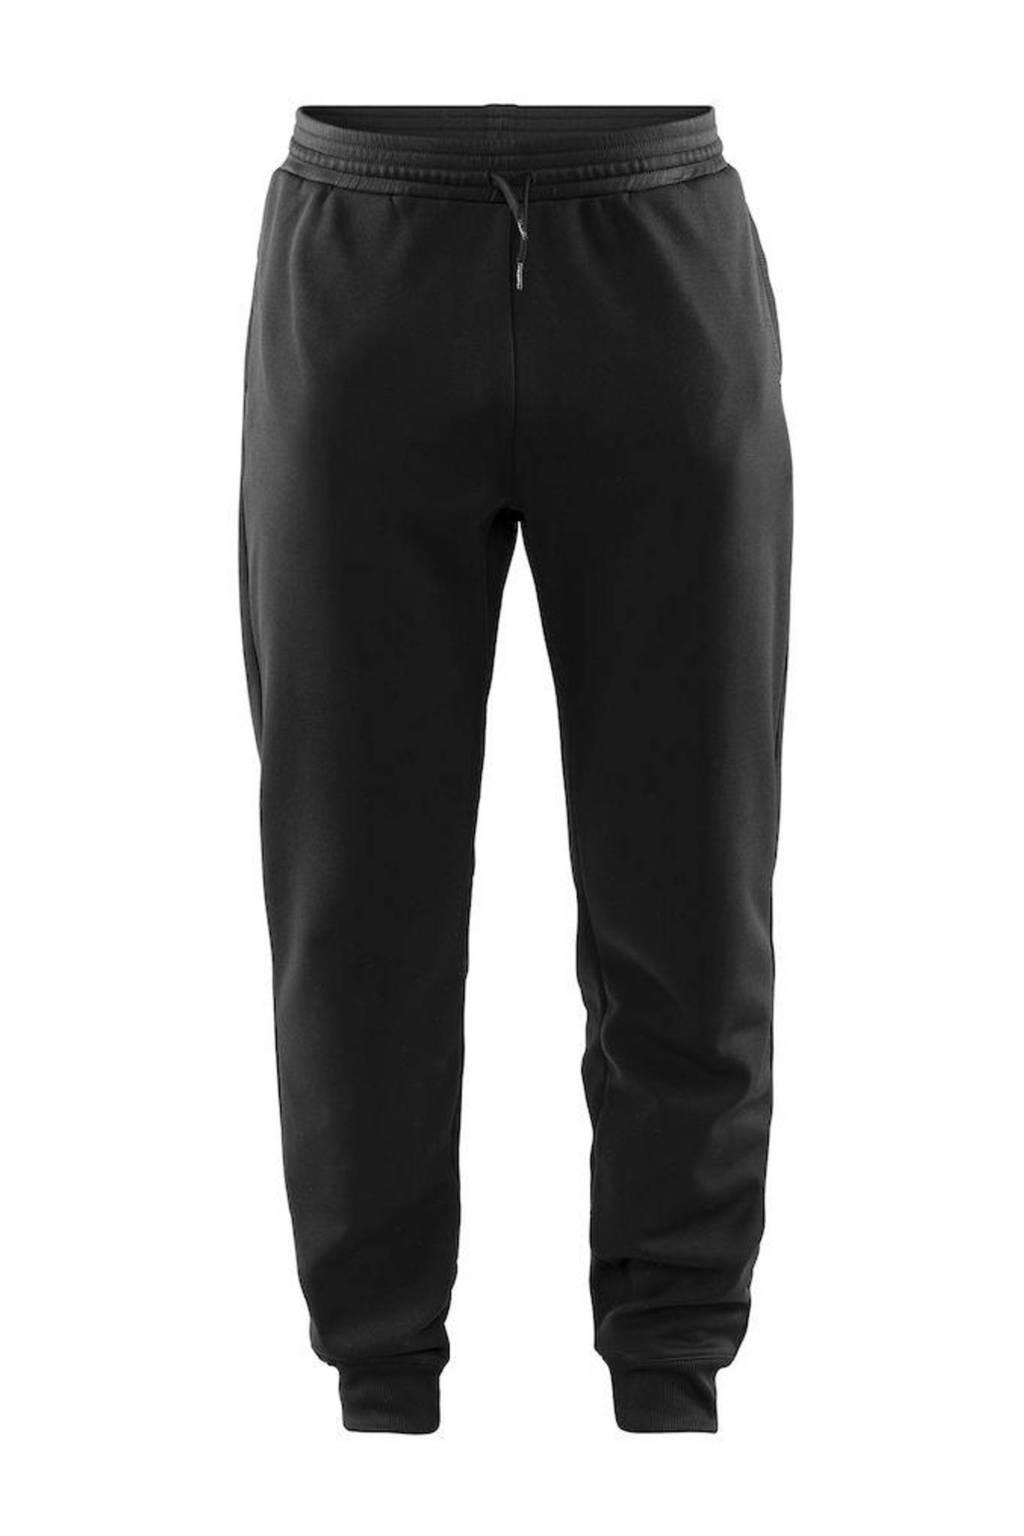 Craft   sportbroek zwart, Zwart